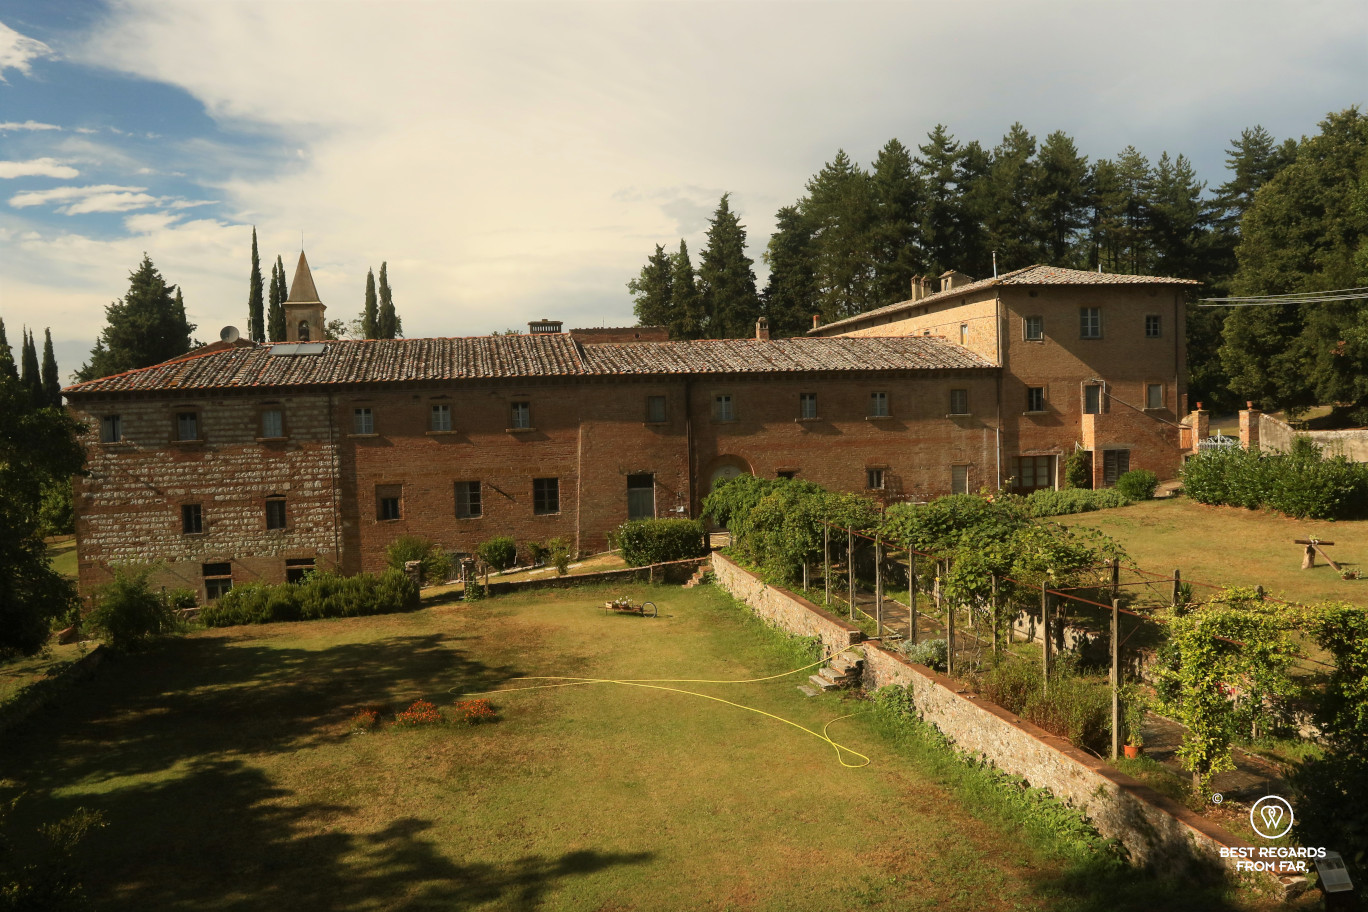 The monastery of San Vivaldo, Tuscany and its garden.